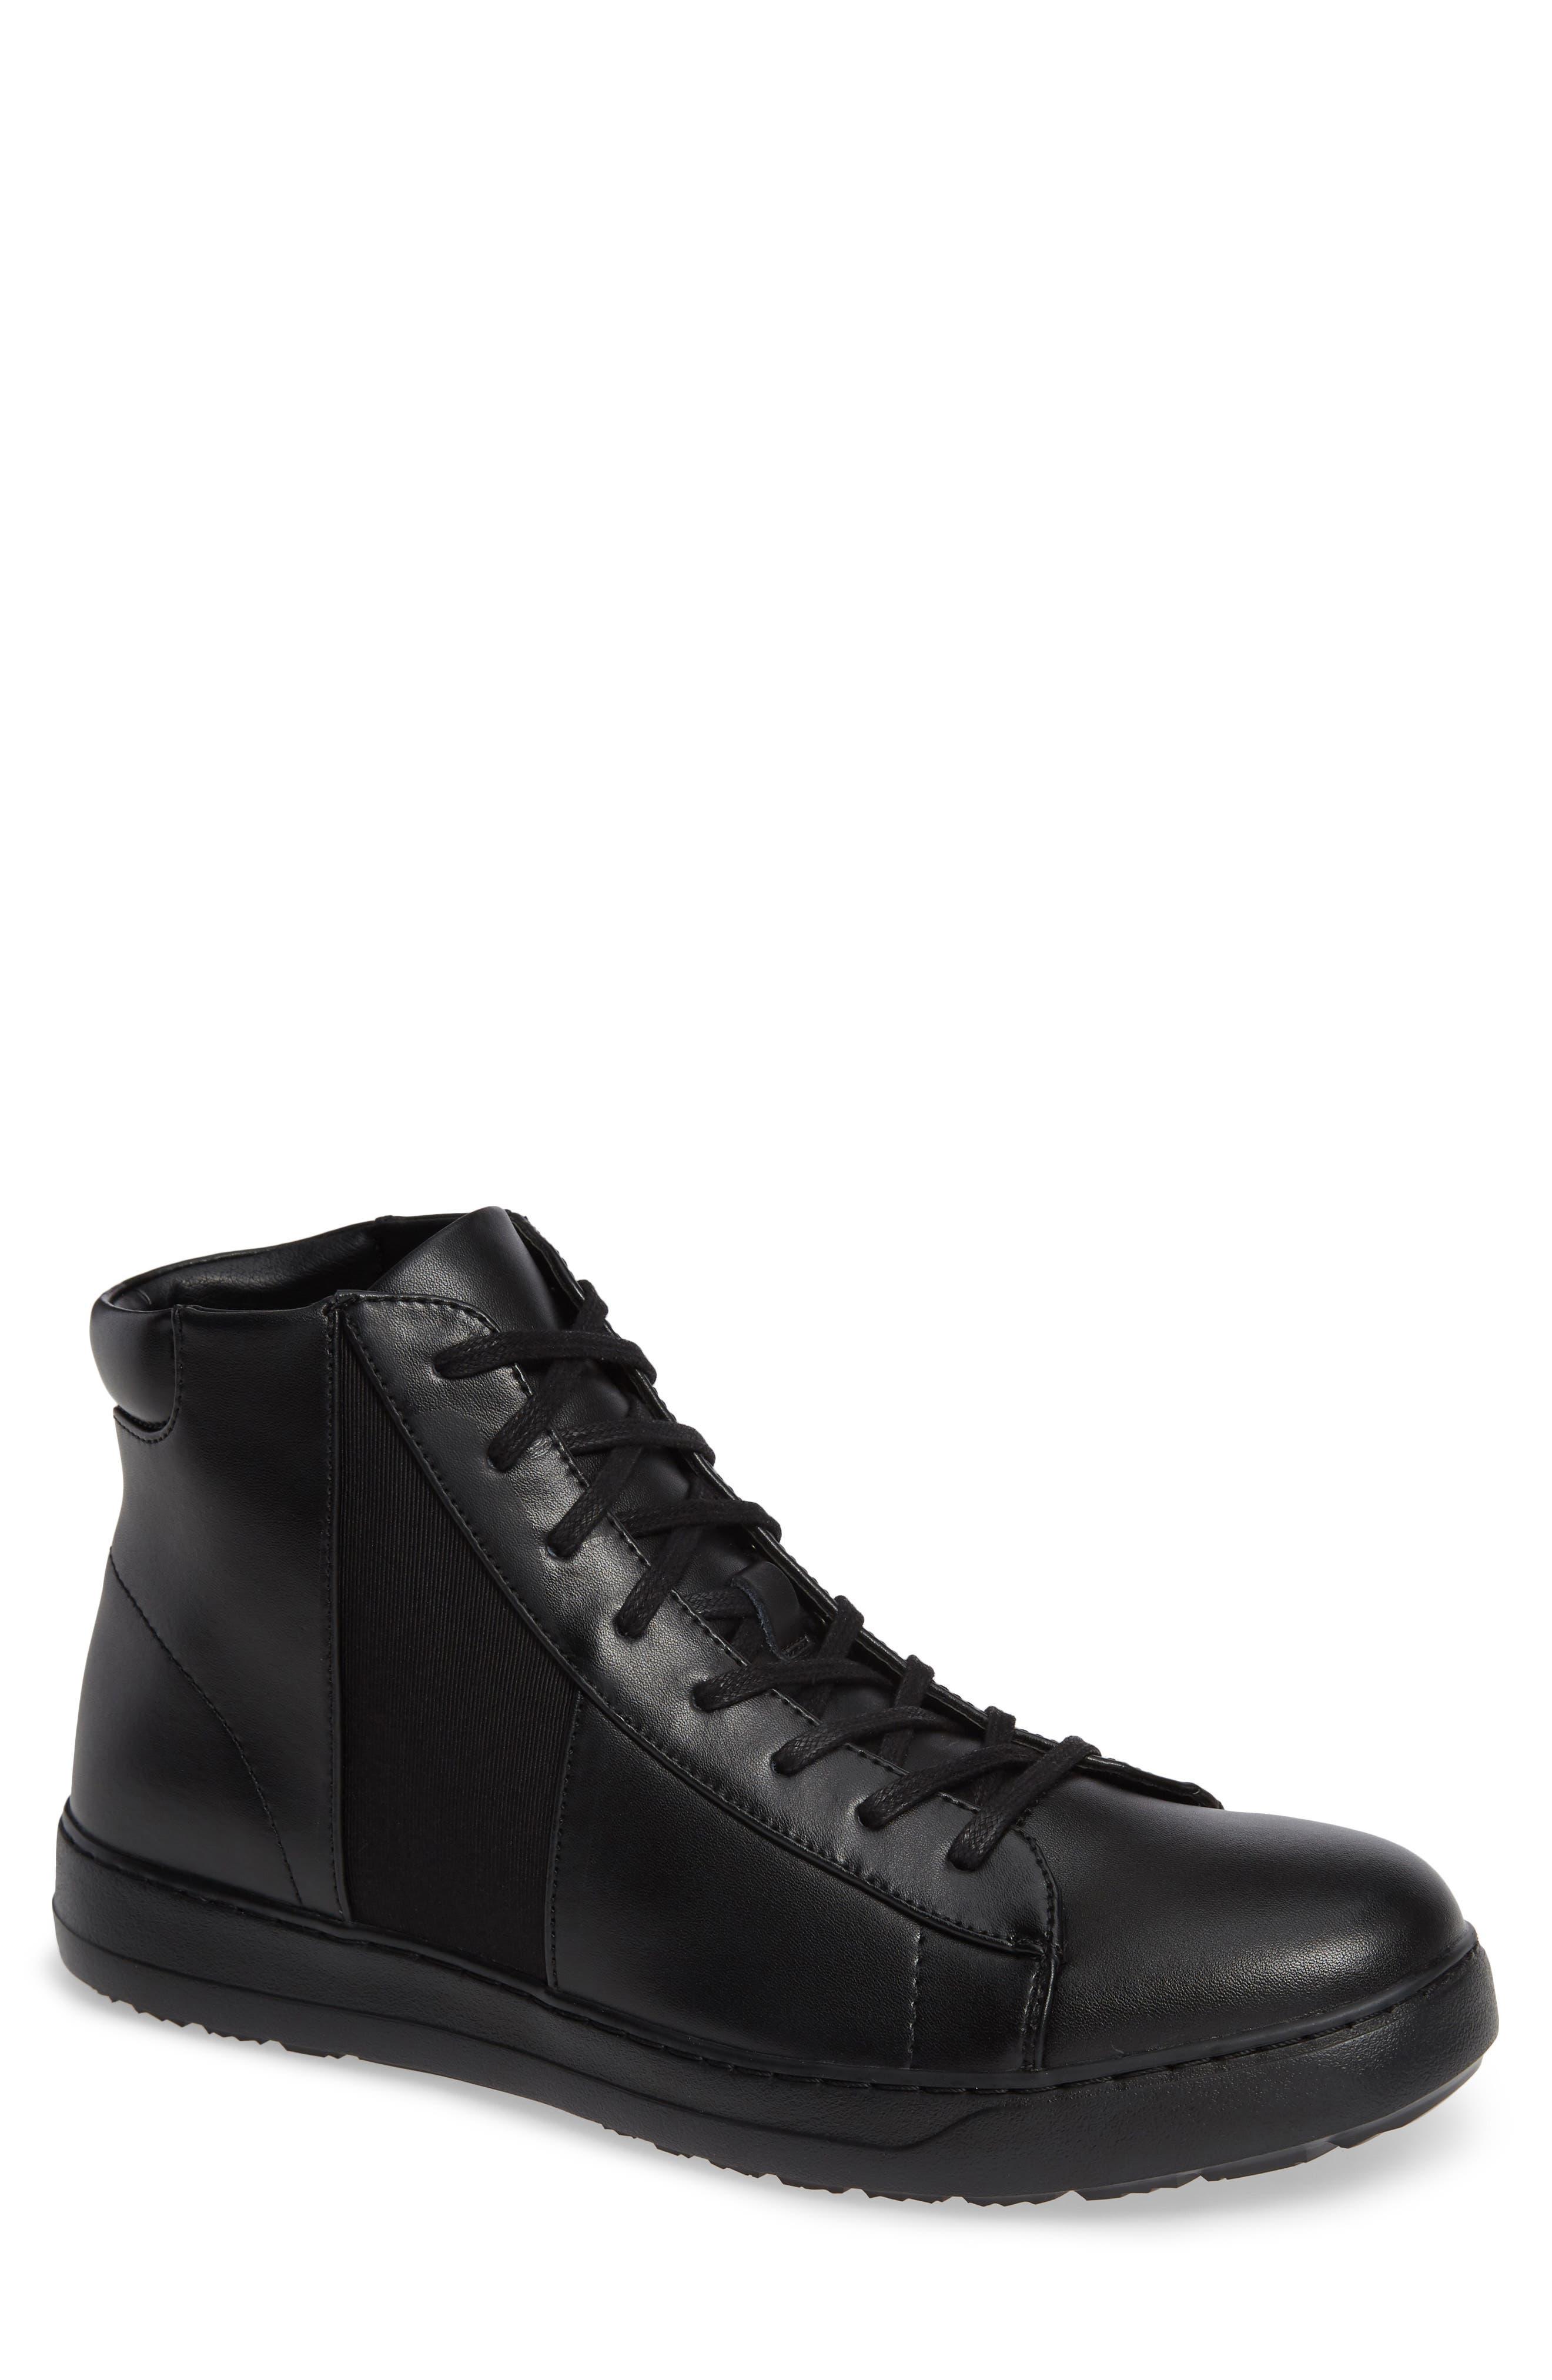 Salvador High Top Sneaker,                         Main,                         color, BLACK/ BLACK LEATHER